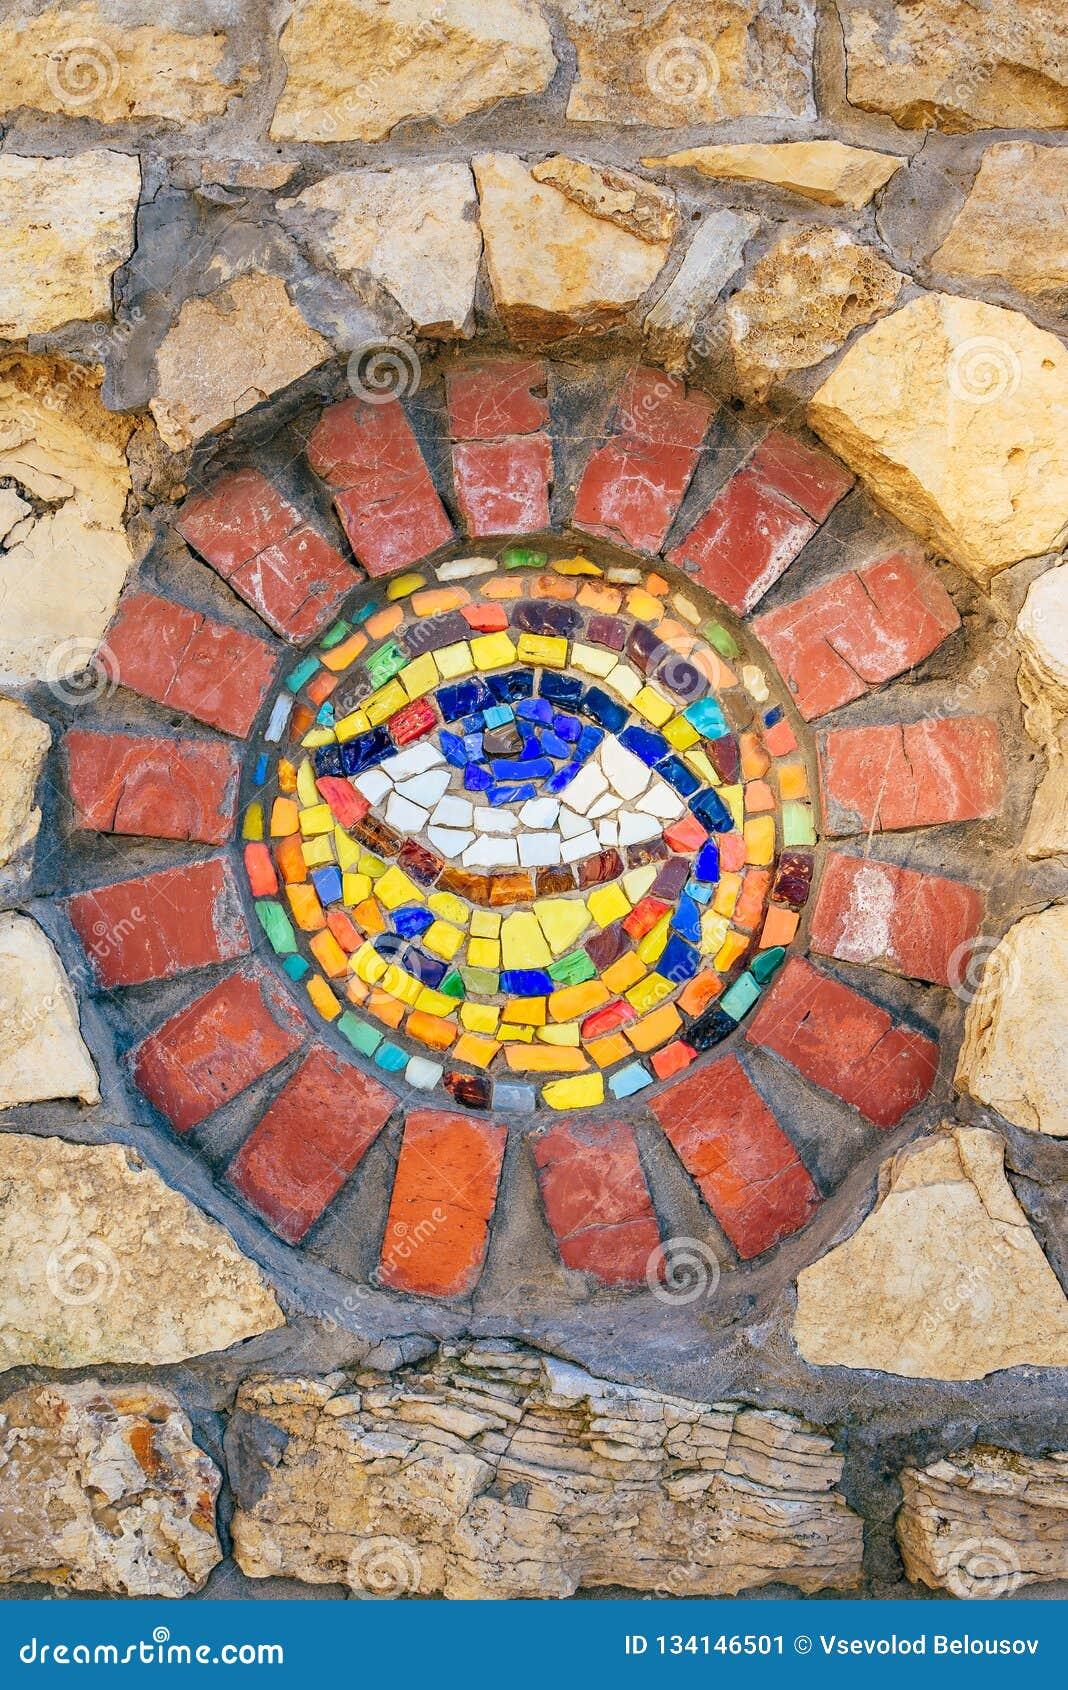 Mosaic Eye of Horus on stone wall